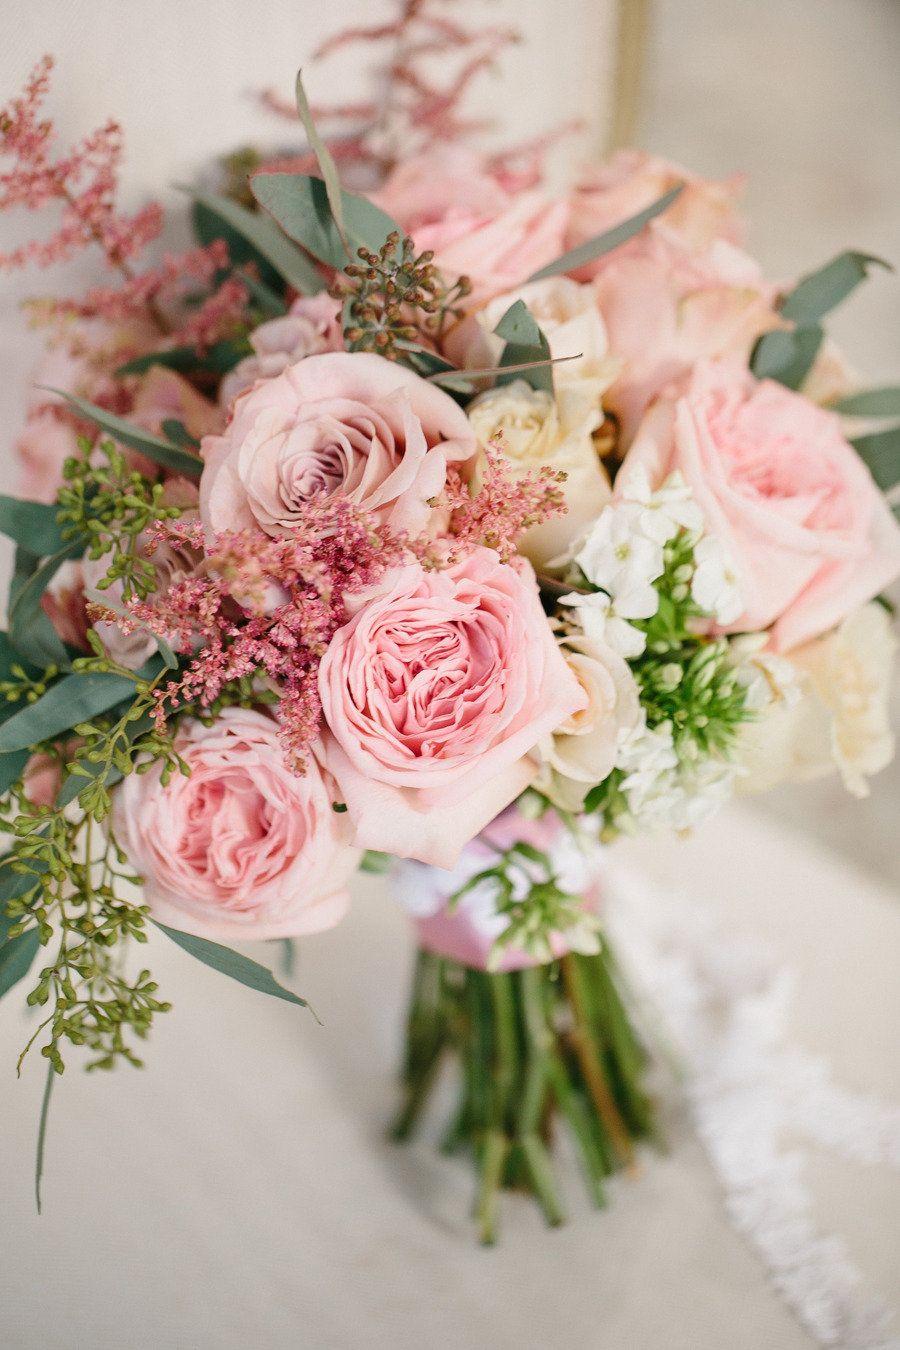 Romantic Victorian Wedding Inspiration from Etablir + Kristen Booth ...